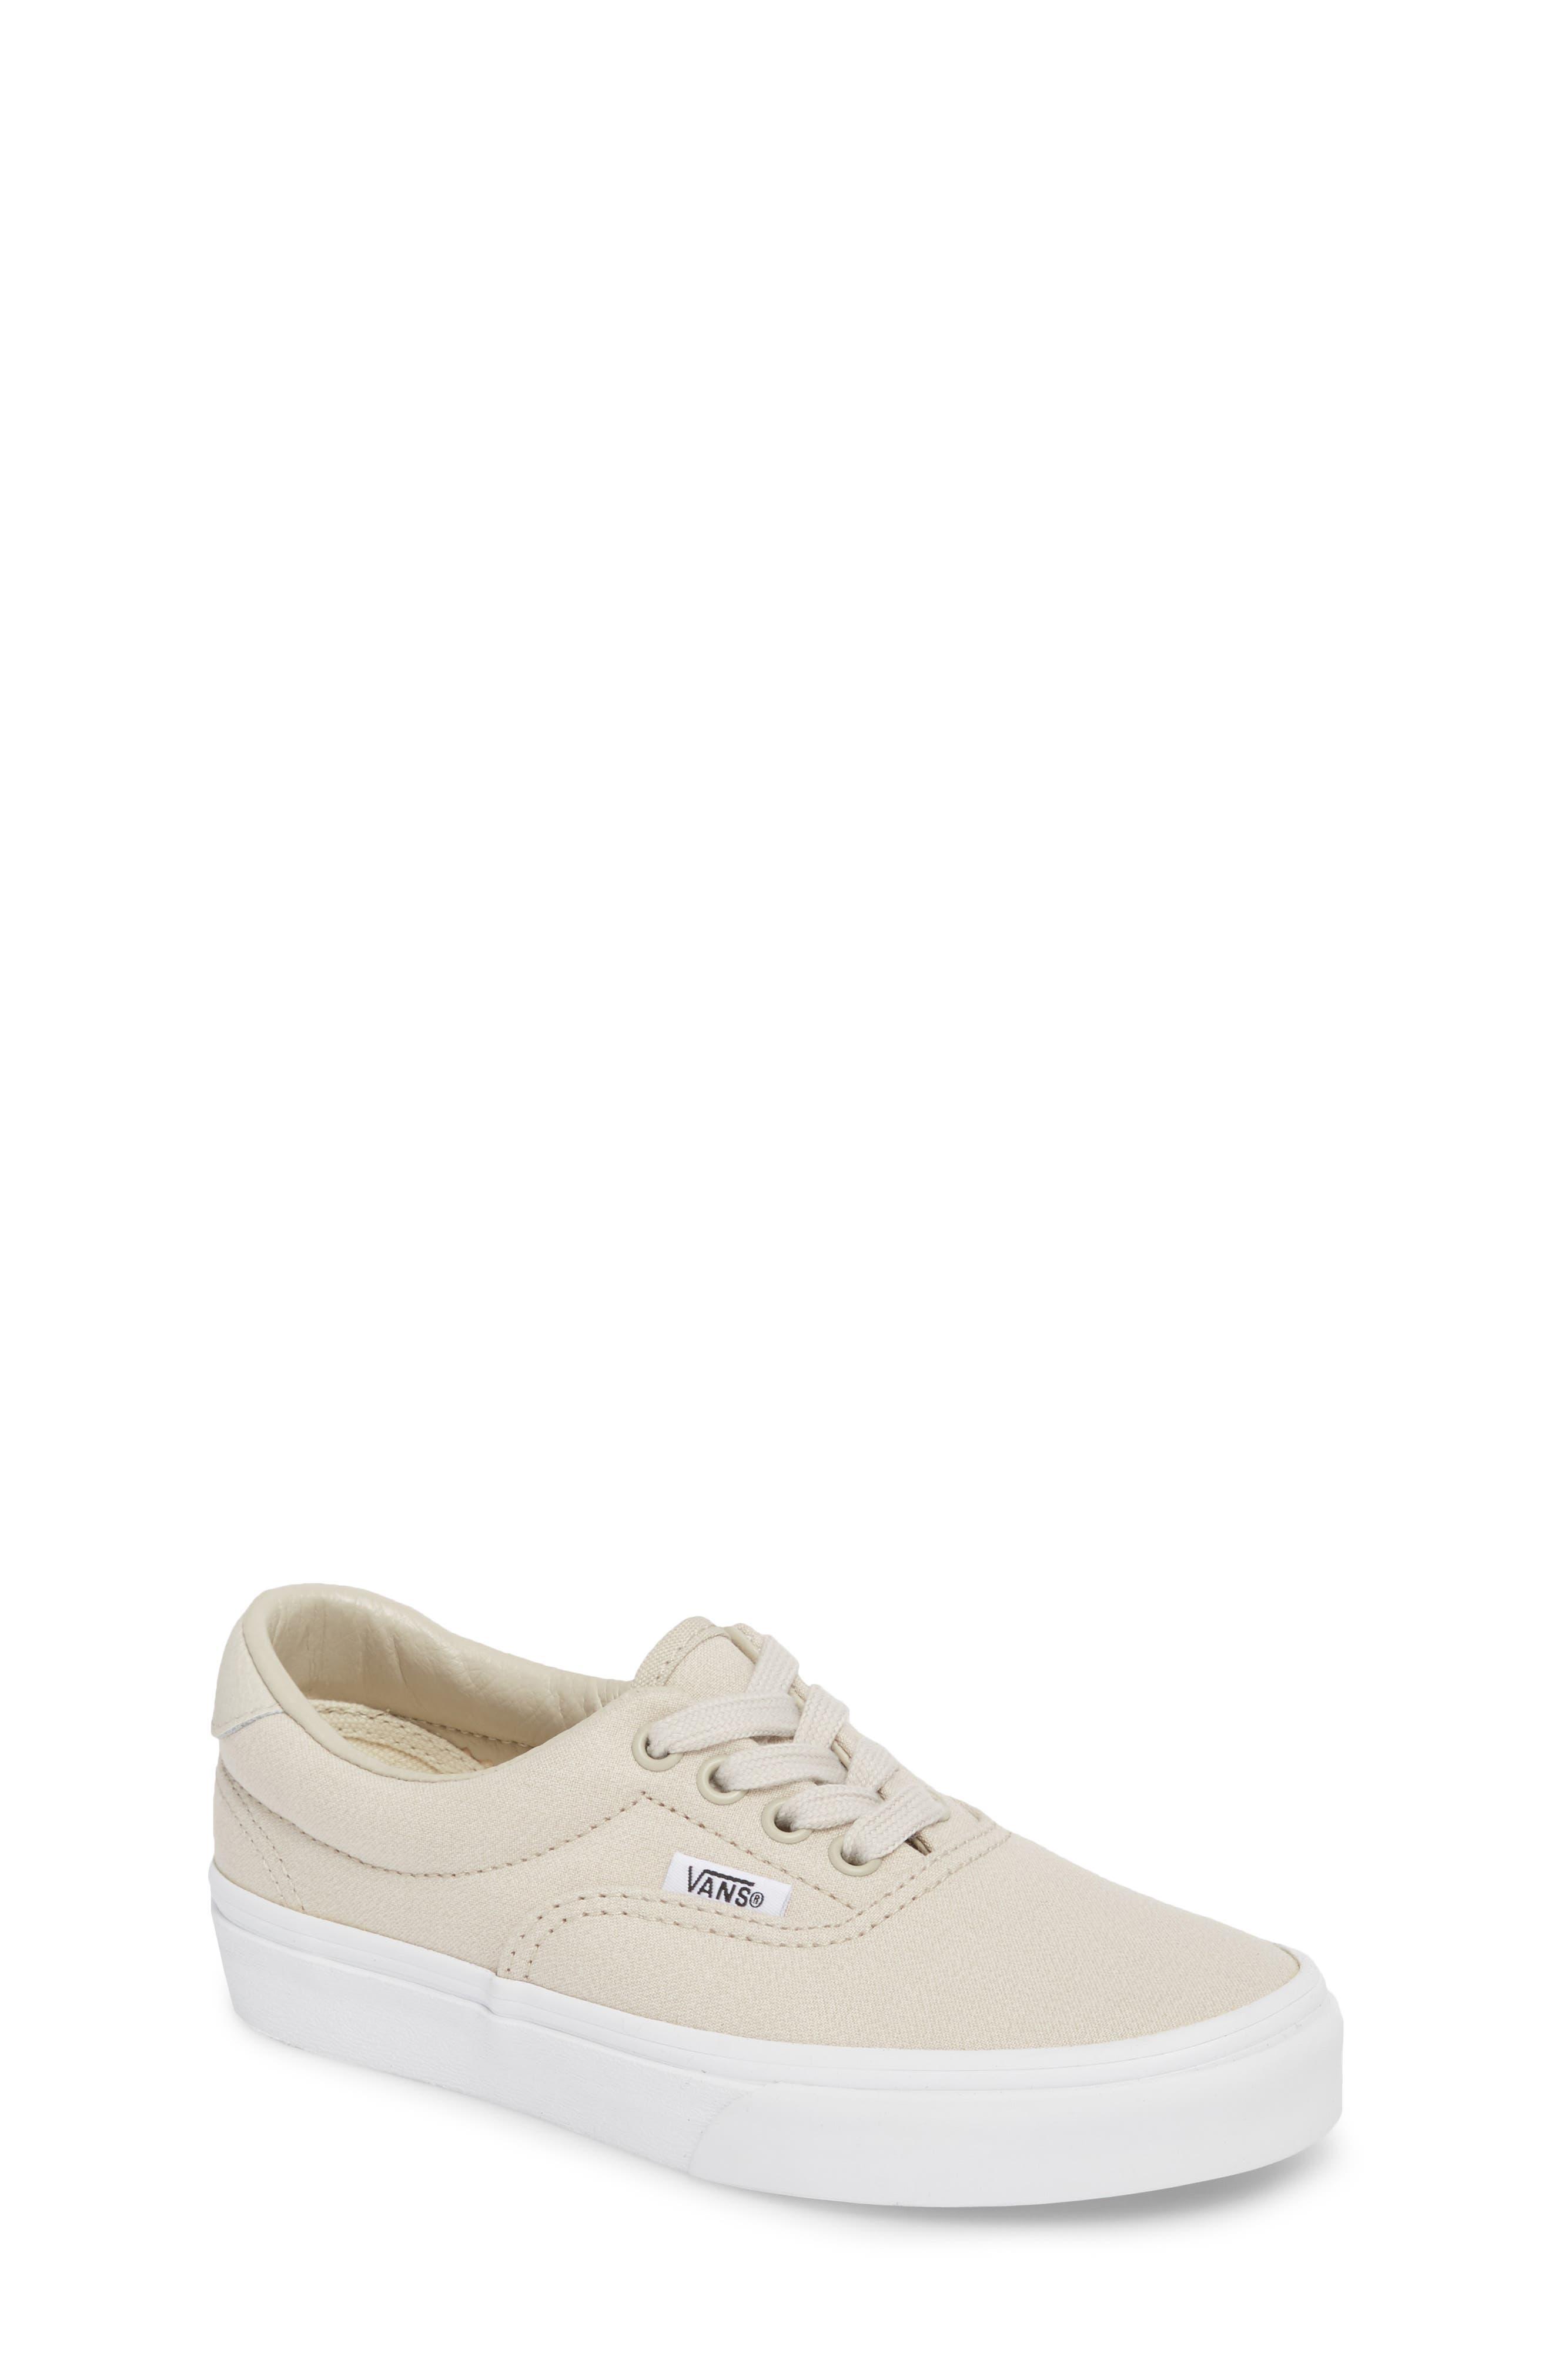 Era 59 Bleacher Sneaker,                             Main thumbnail 1, color,                             Silver Lining/ True White